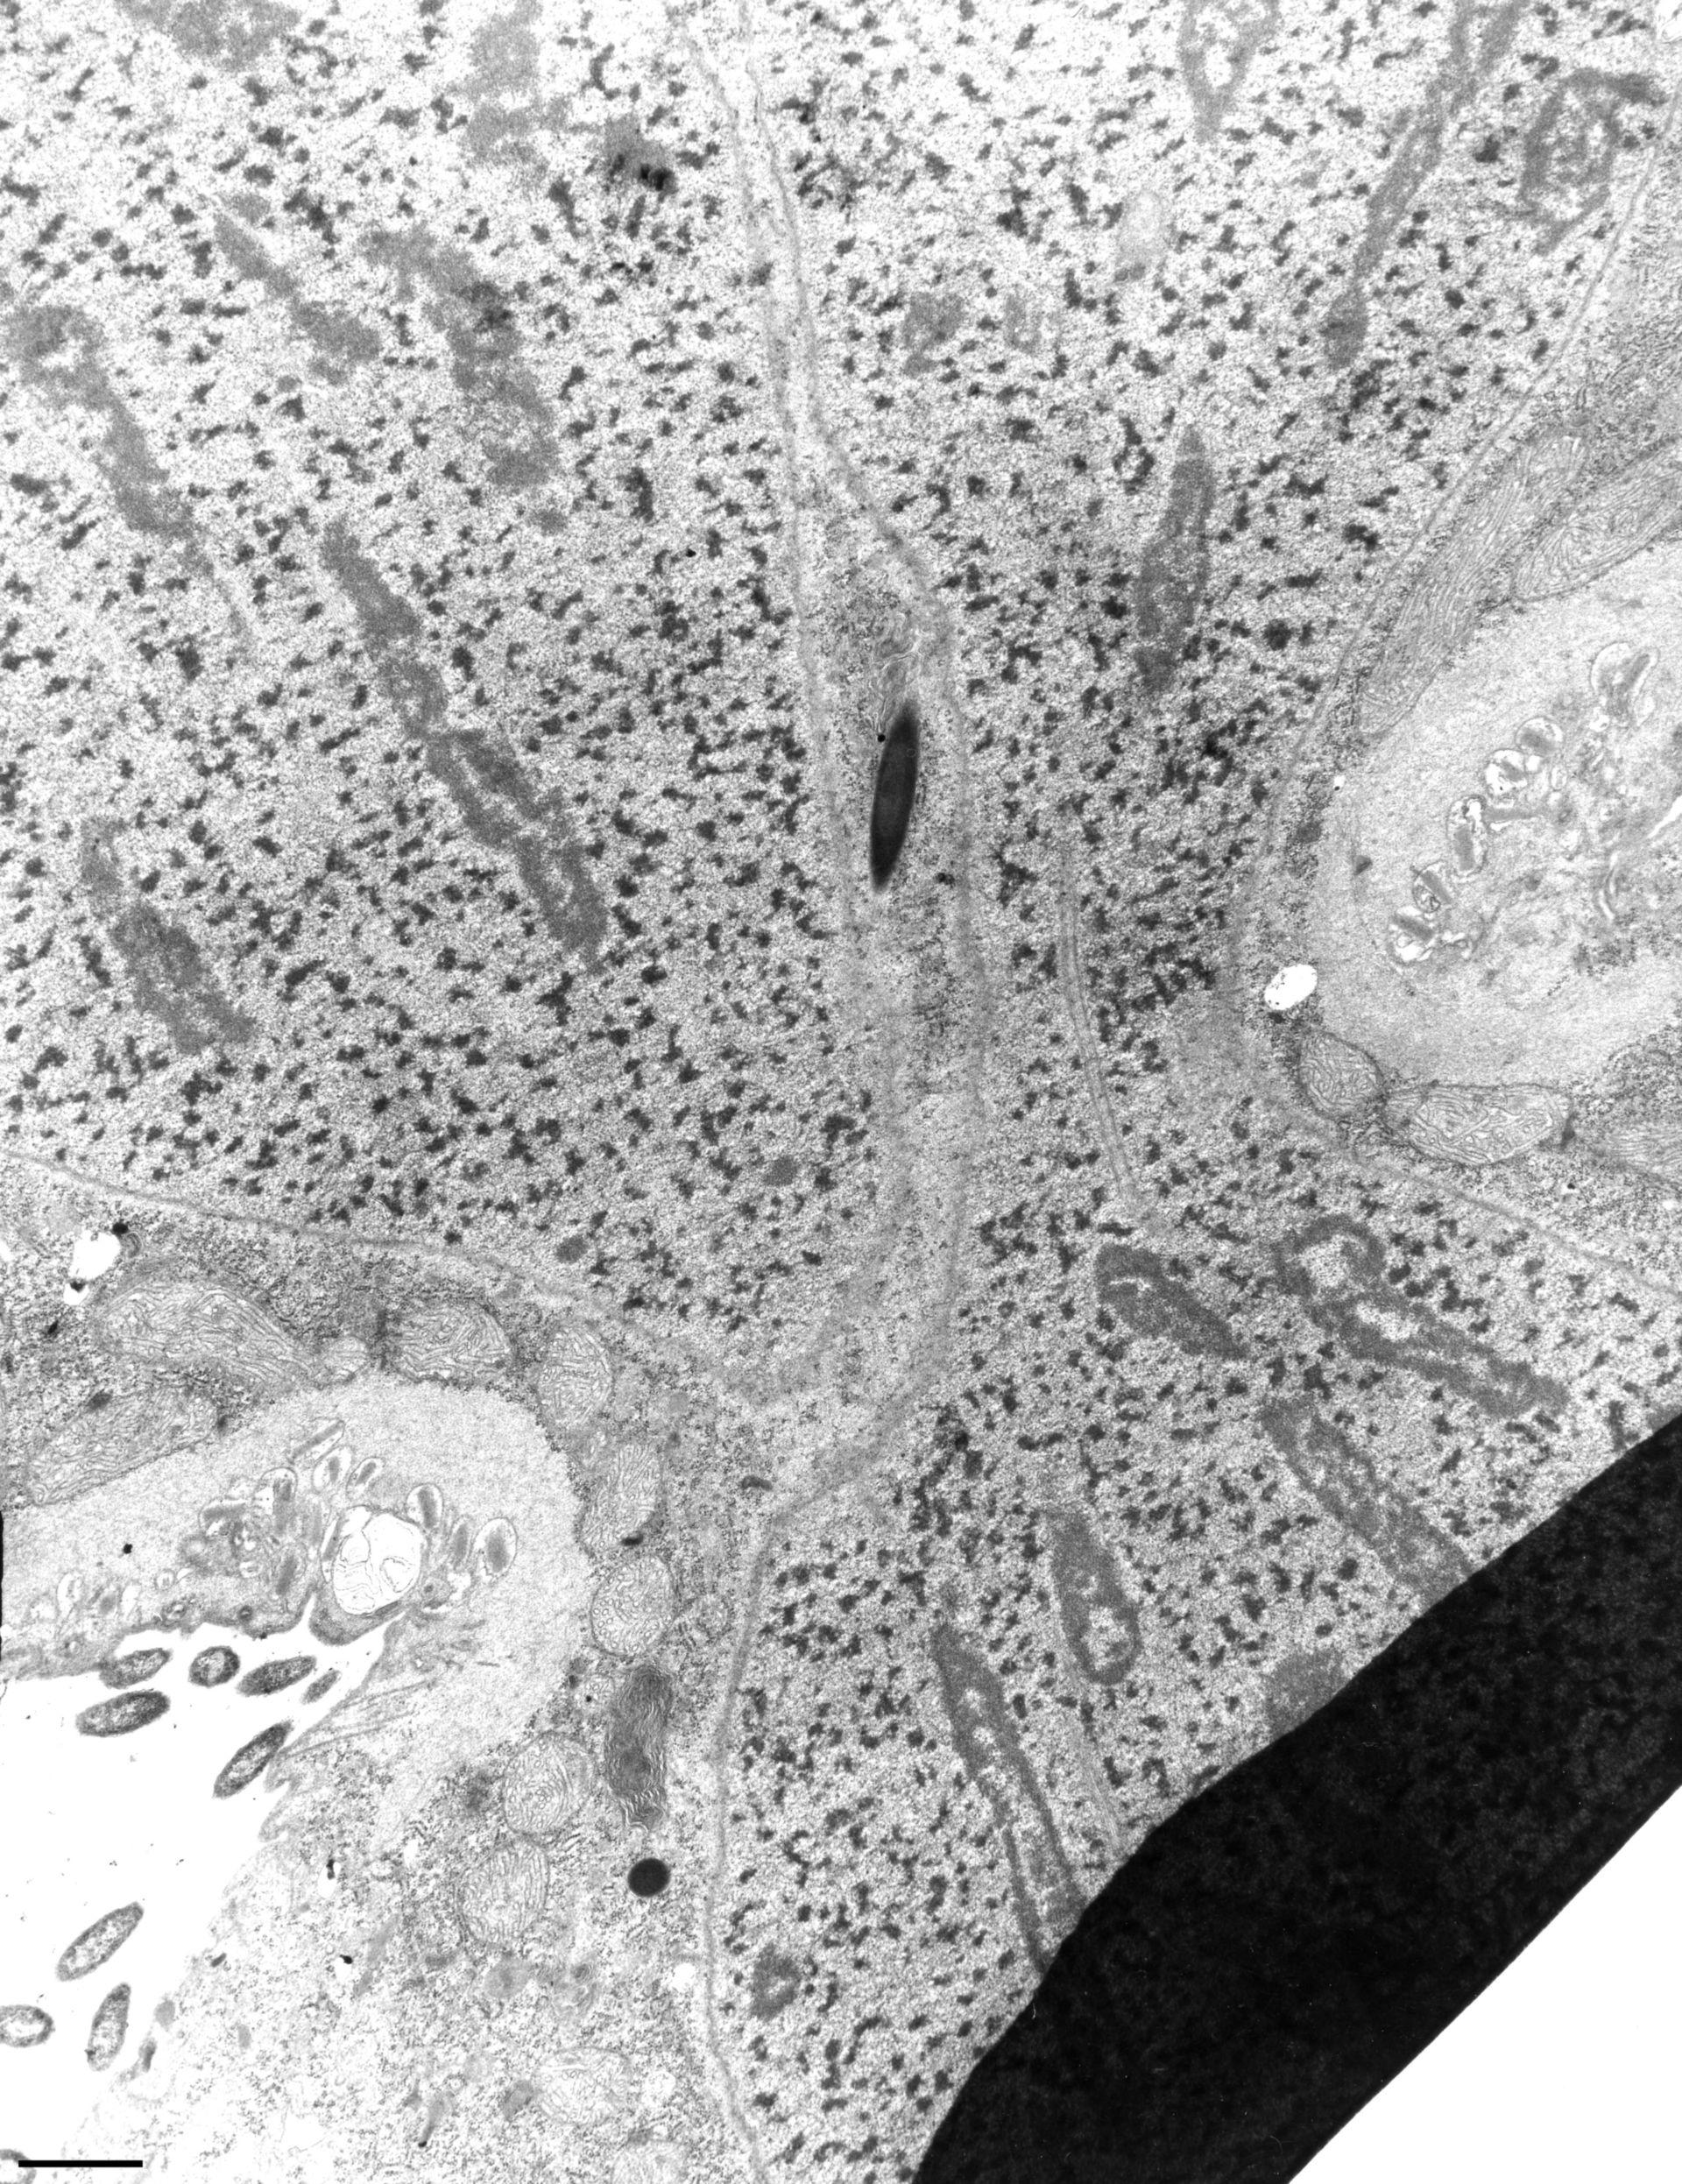 Didinium nasutum (Nucleolar chromatin) - CIL:12303